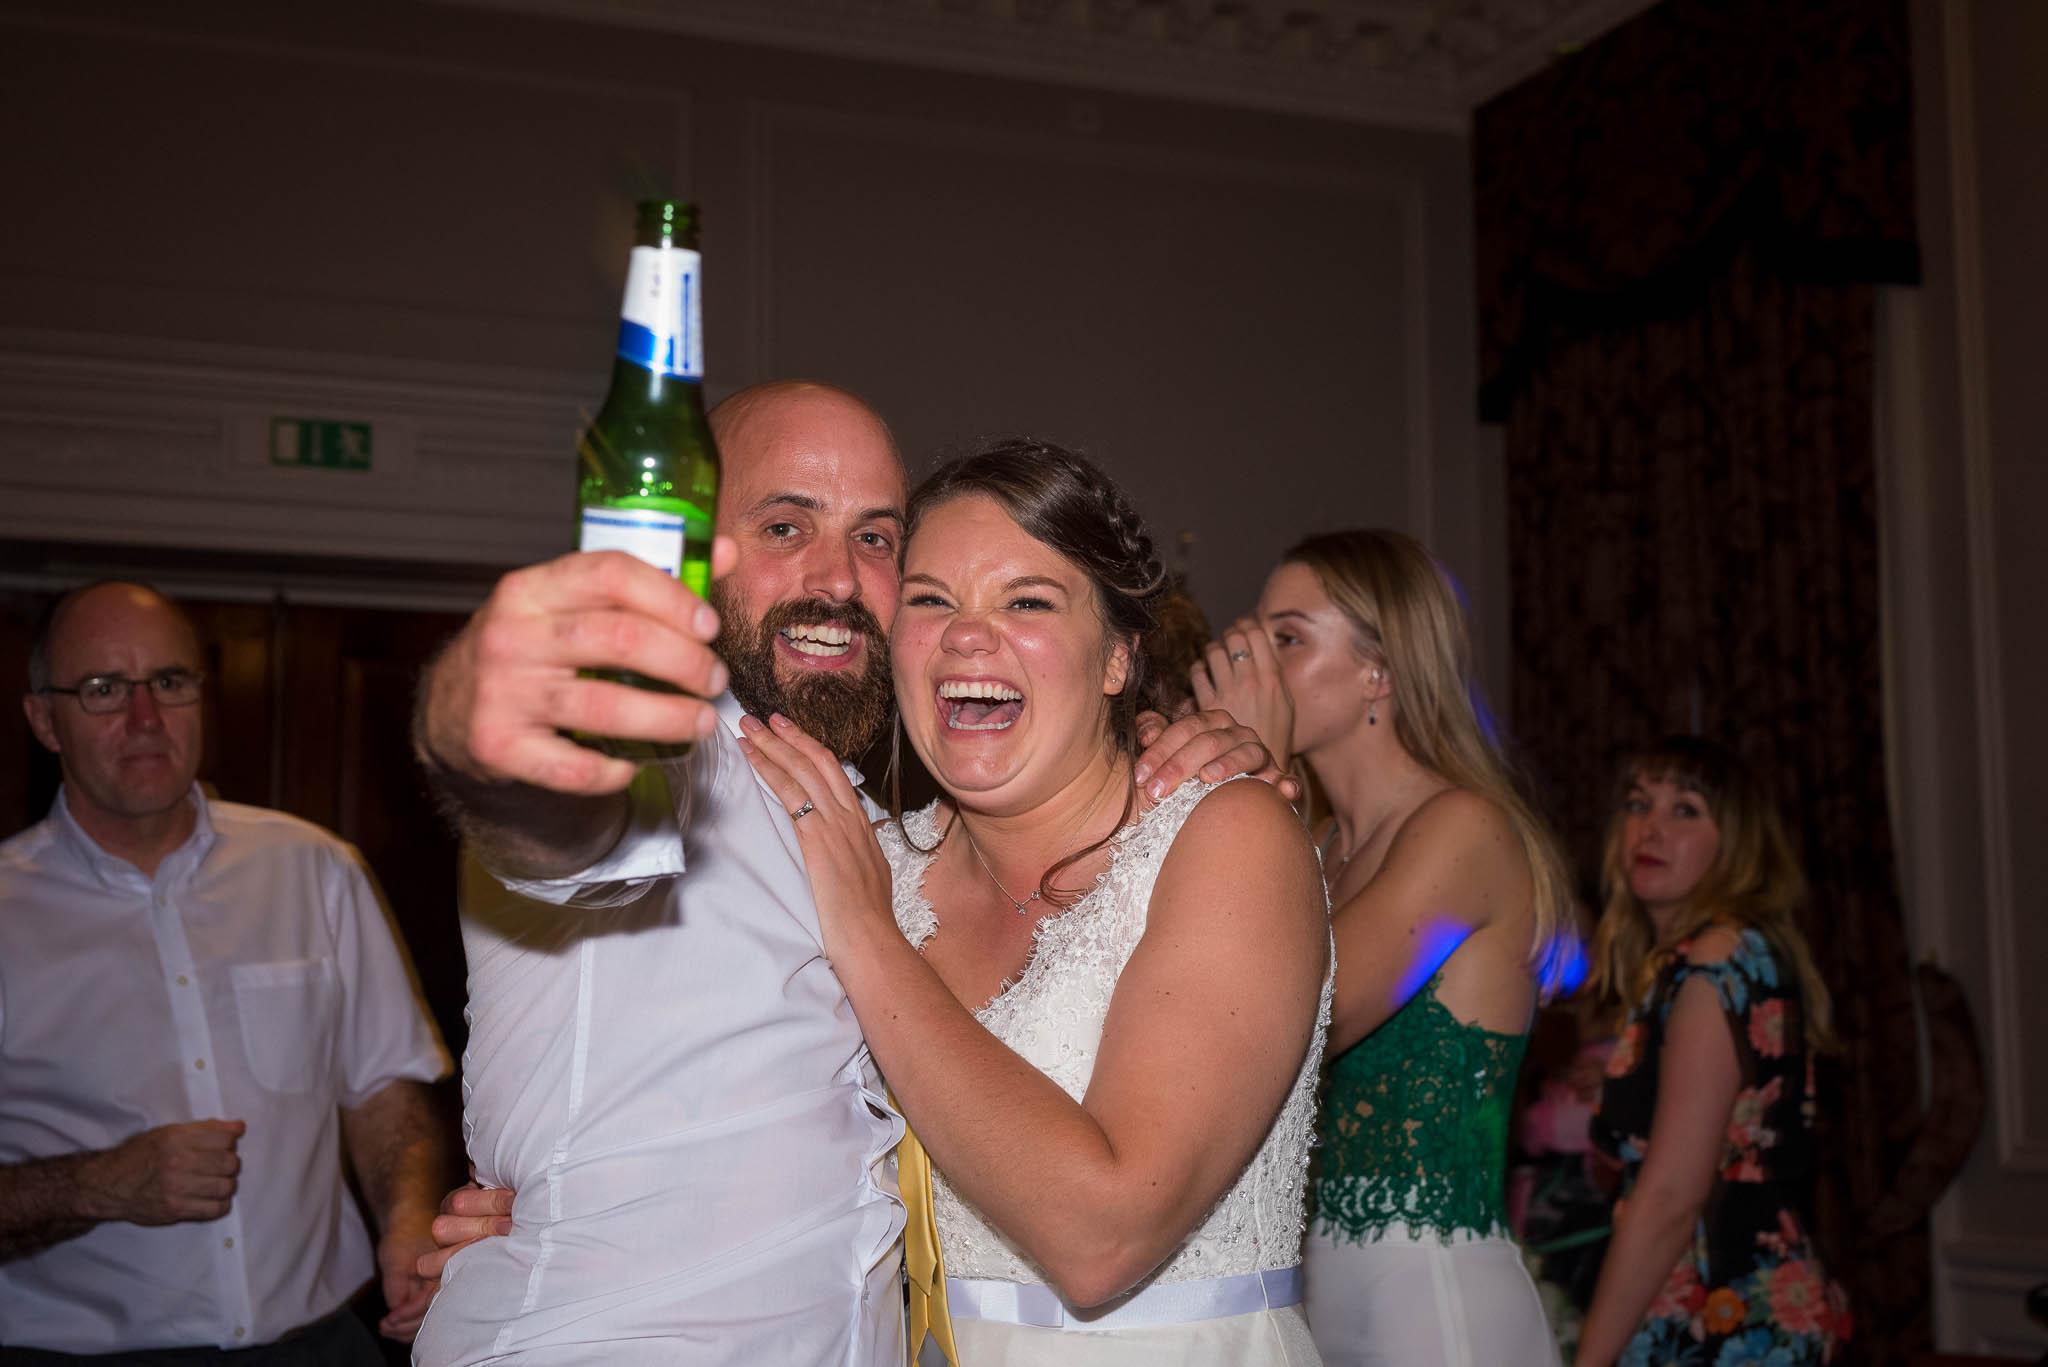 Crathorne Hall Hotel Wedding Photographer90.jpg